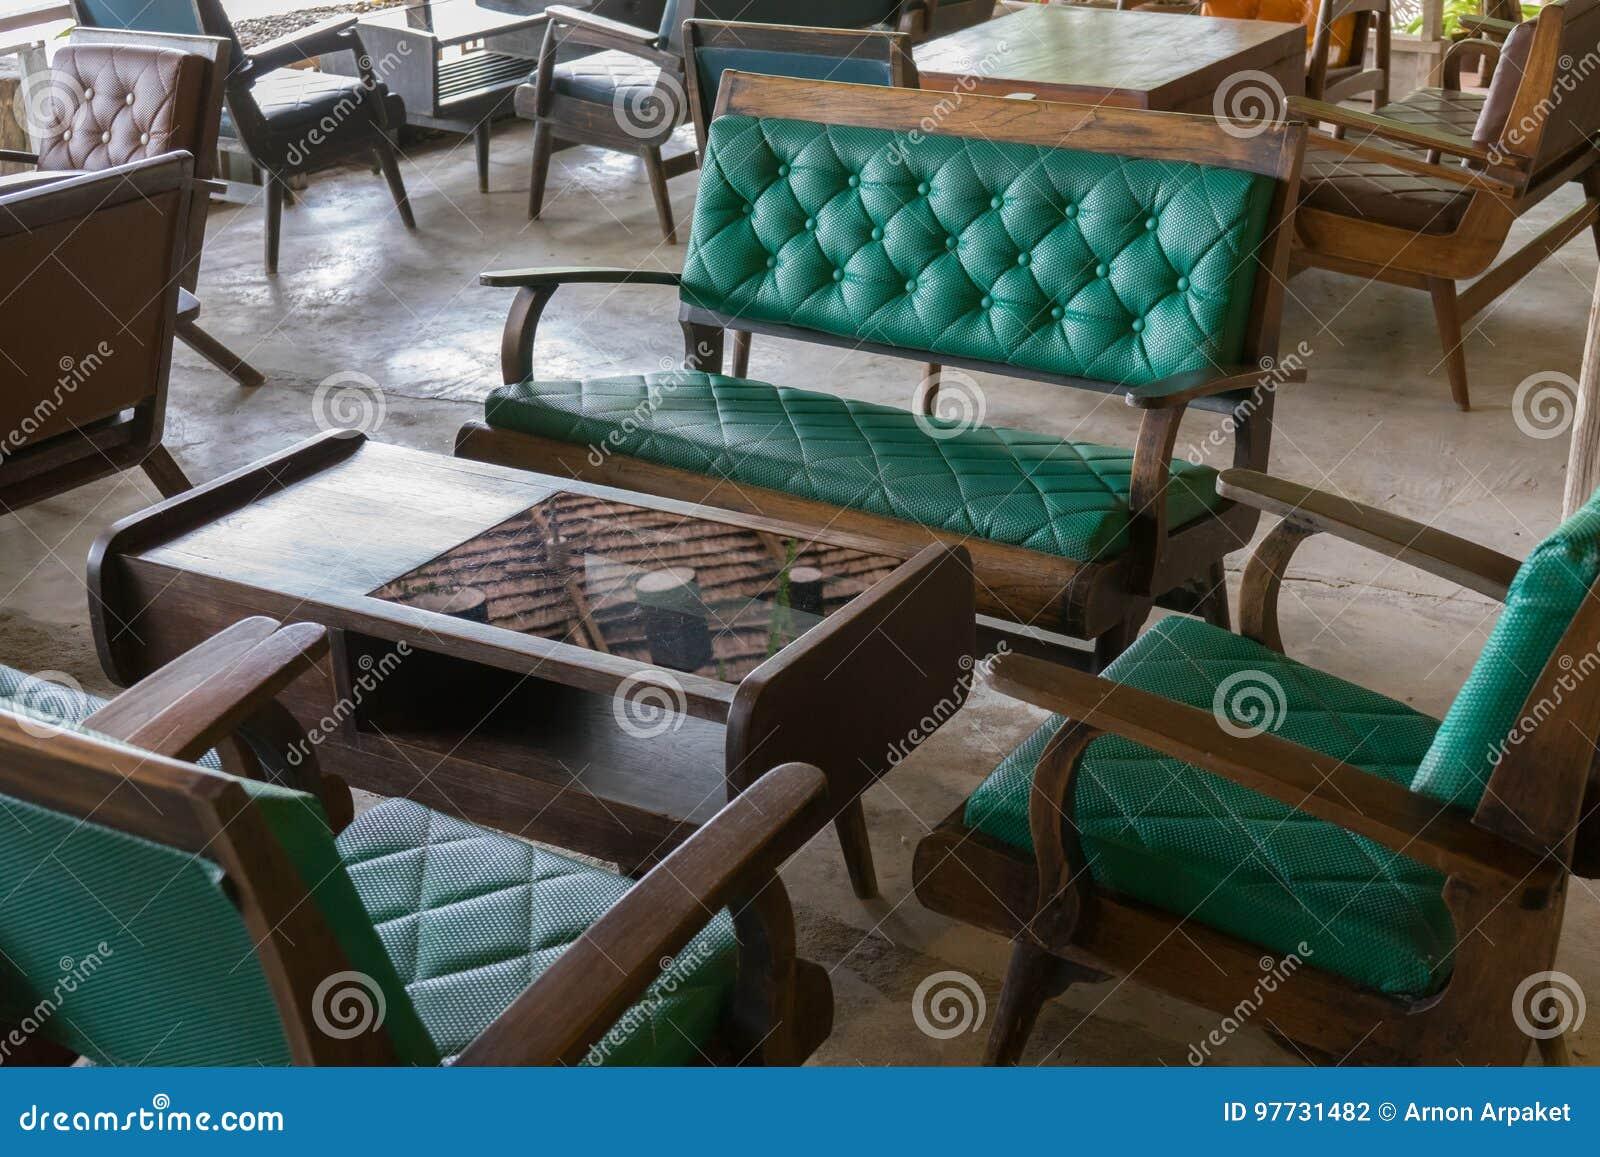 Admirable Antique Sofa Furniture Indoor Interior Design Stock Photo Alphanode Cool Chair Designs And Ideas Alphanodeonline